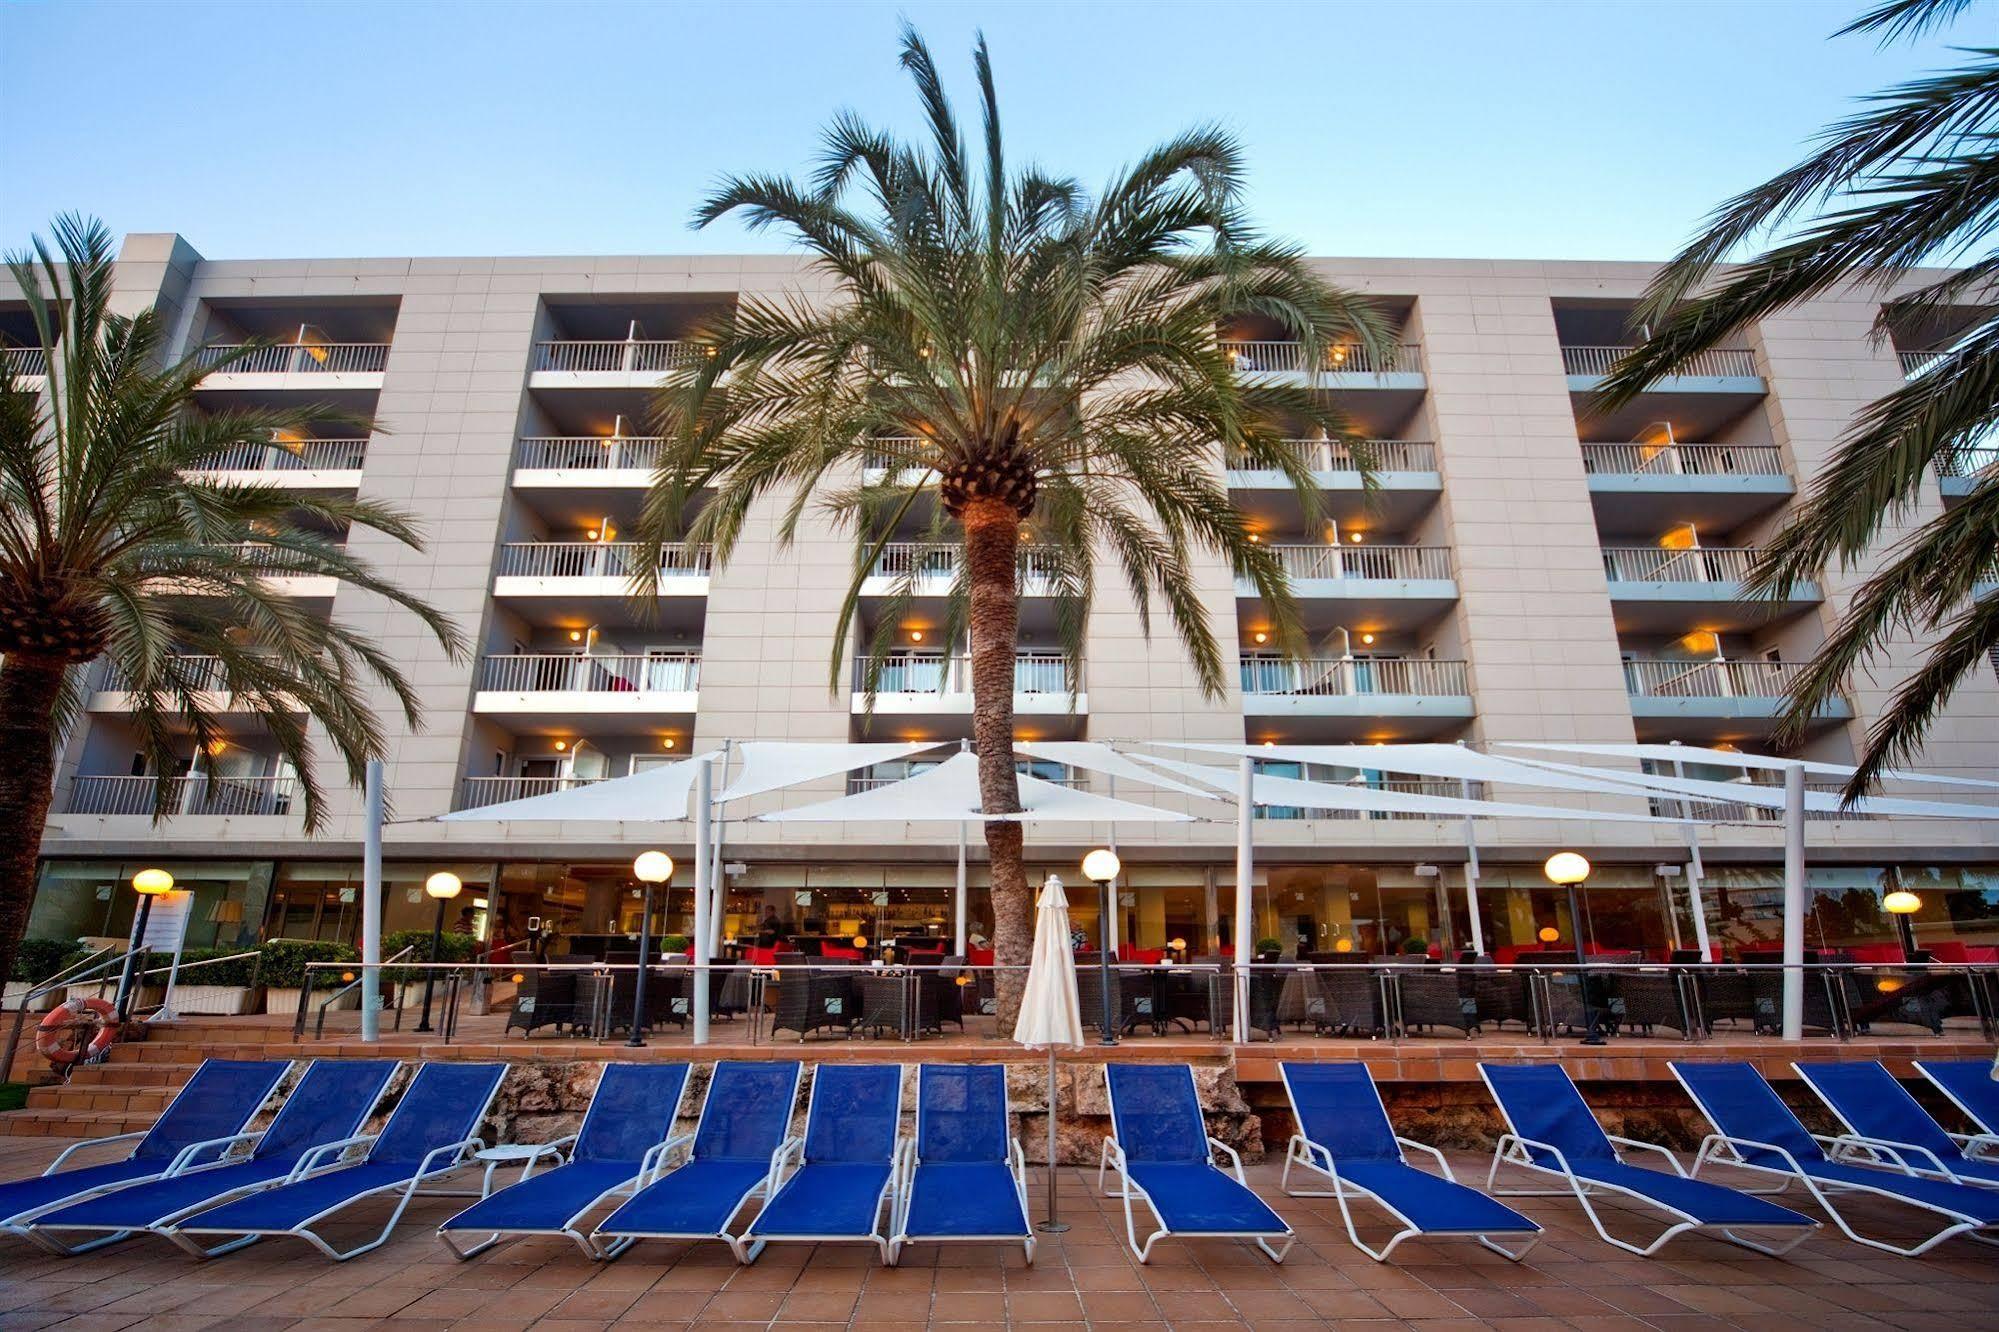 Hotel Cosmopolitan - Playa De Palma